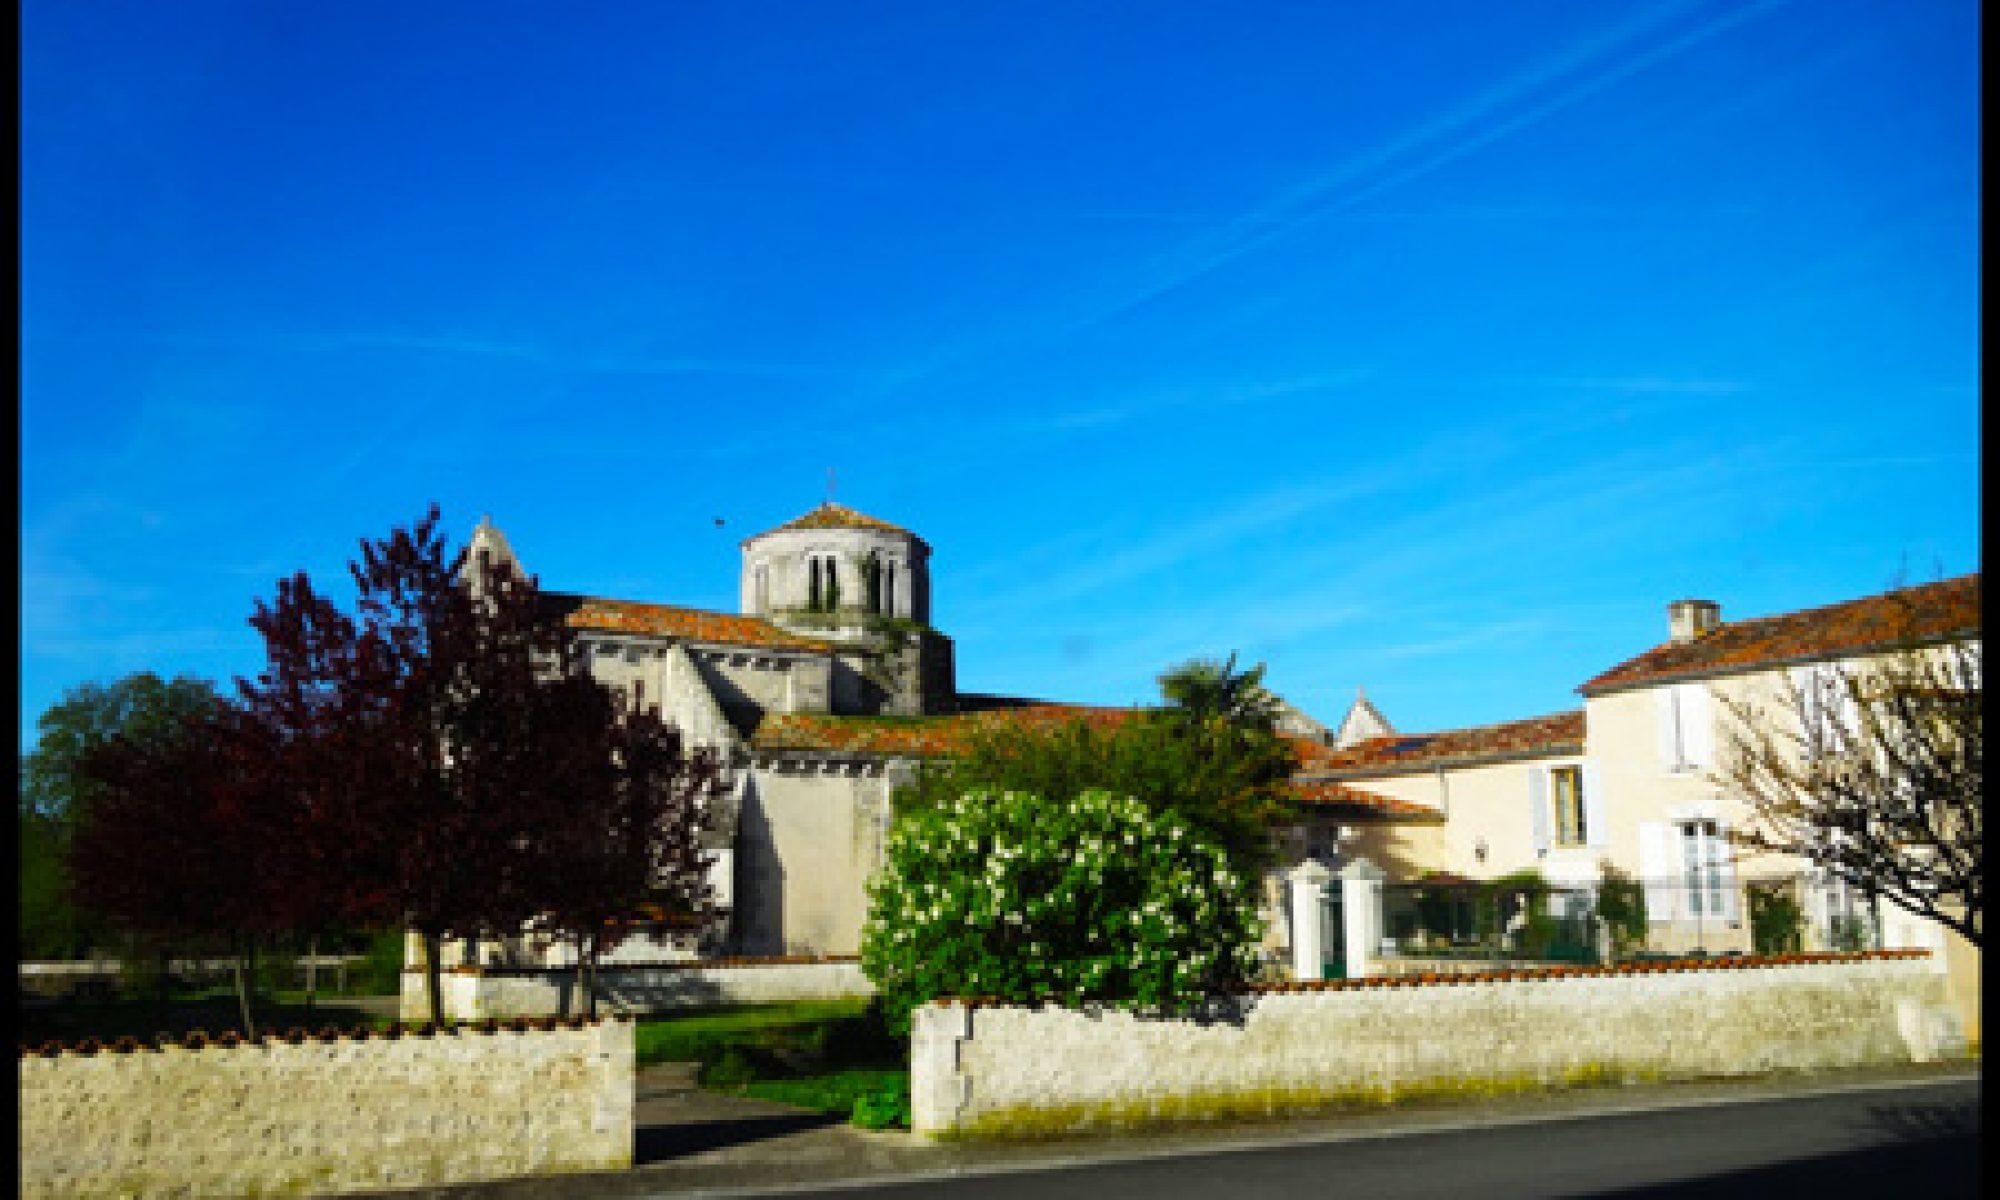 Commune de Criteuil-la-Magdeleine